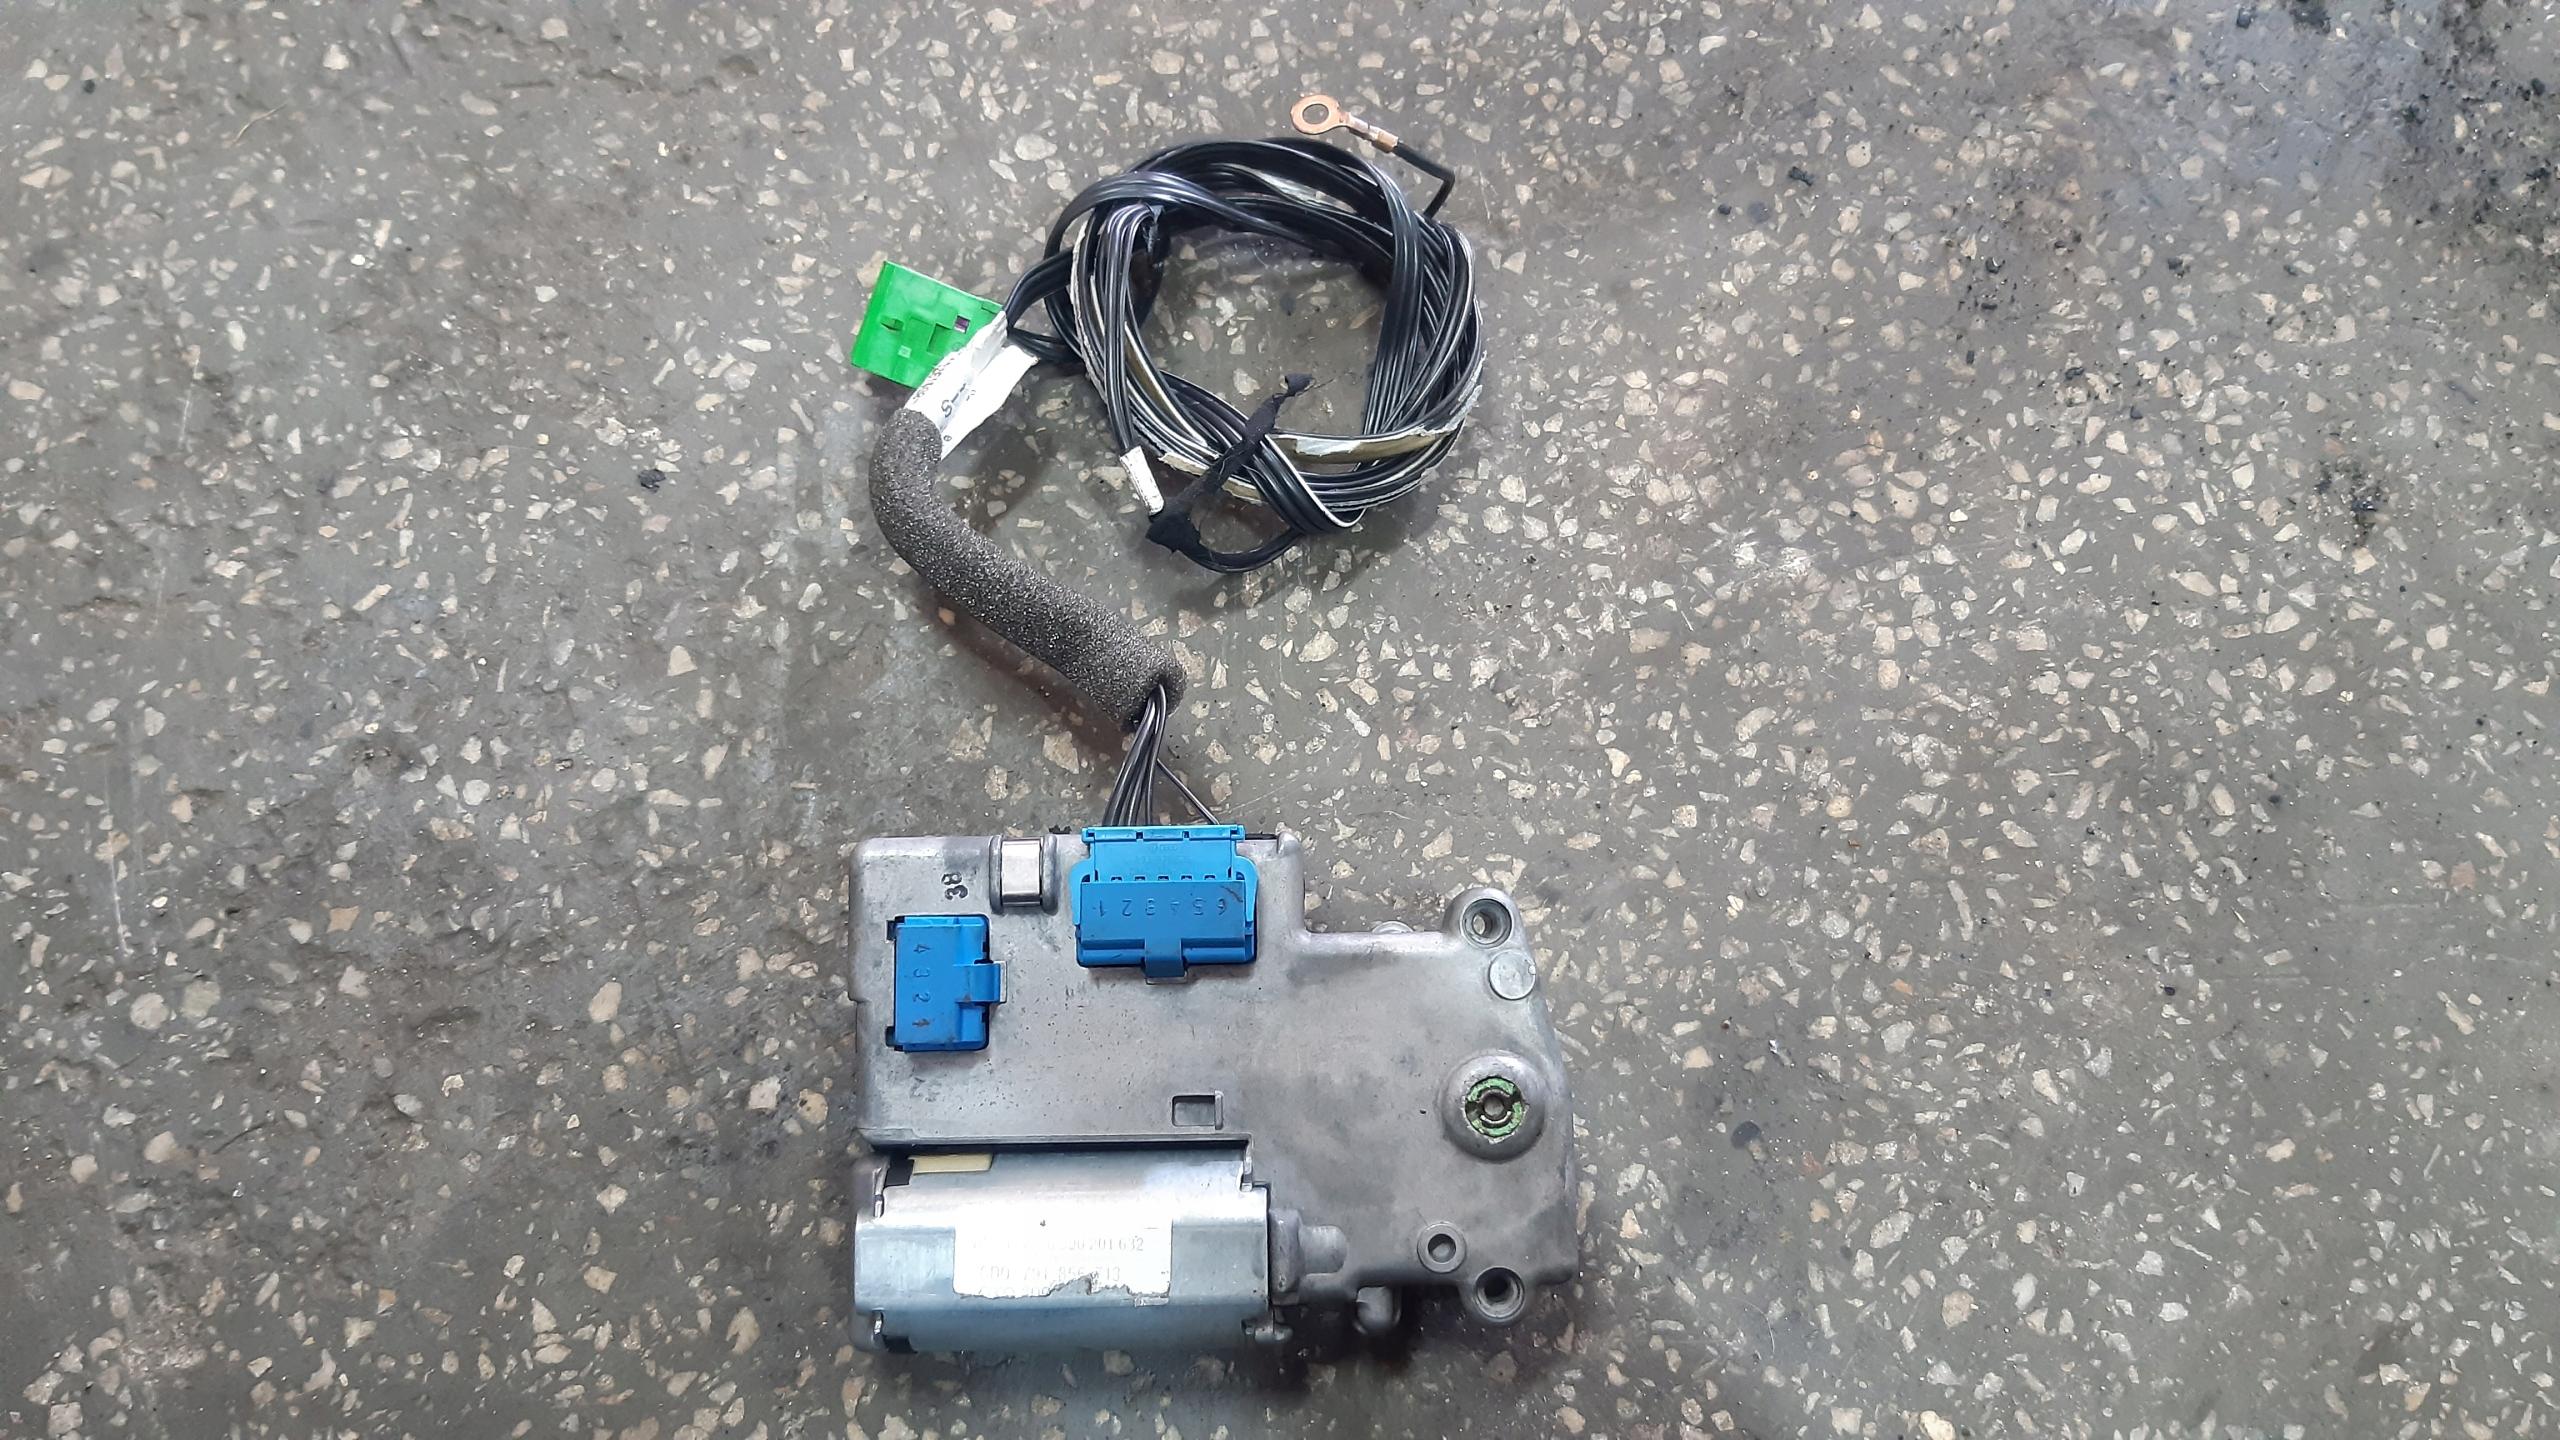 двигатель люка audi a4 b5 95-98r